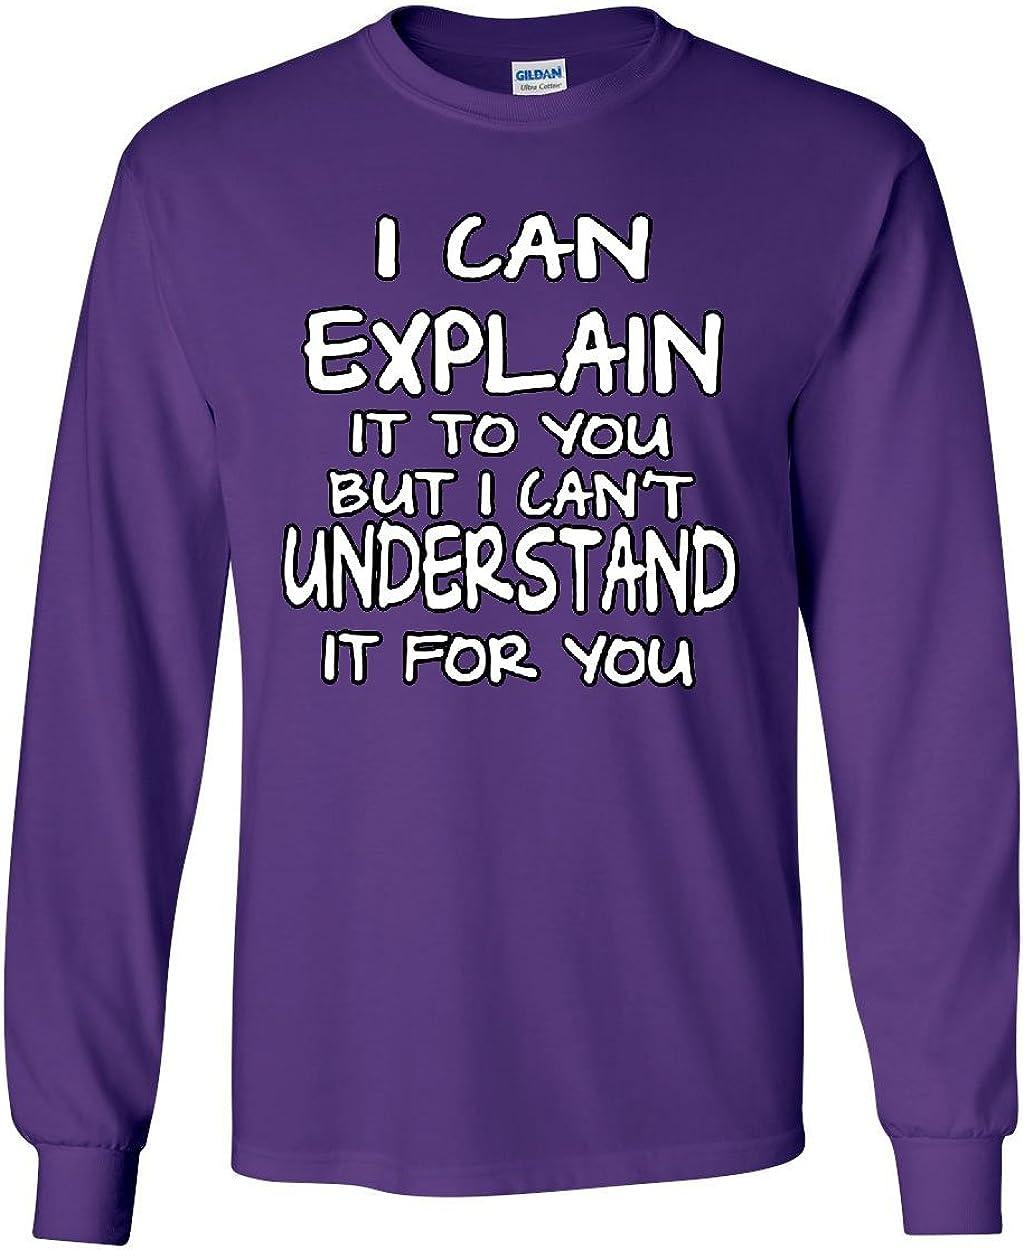 Tee Hunt I Can Explain It to You Womens Sweatshirt Funny College Humor Geek Nerd